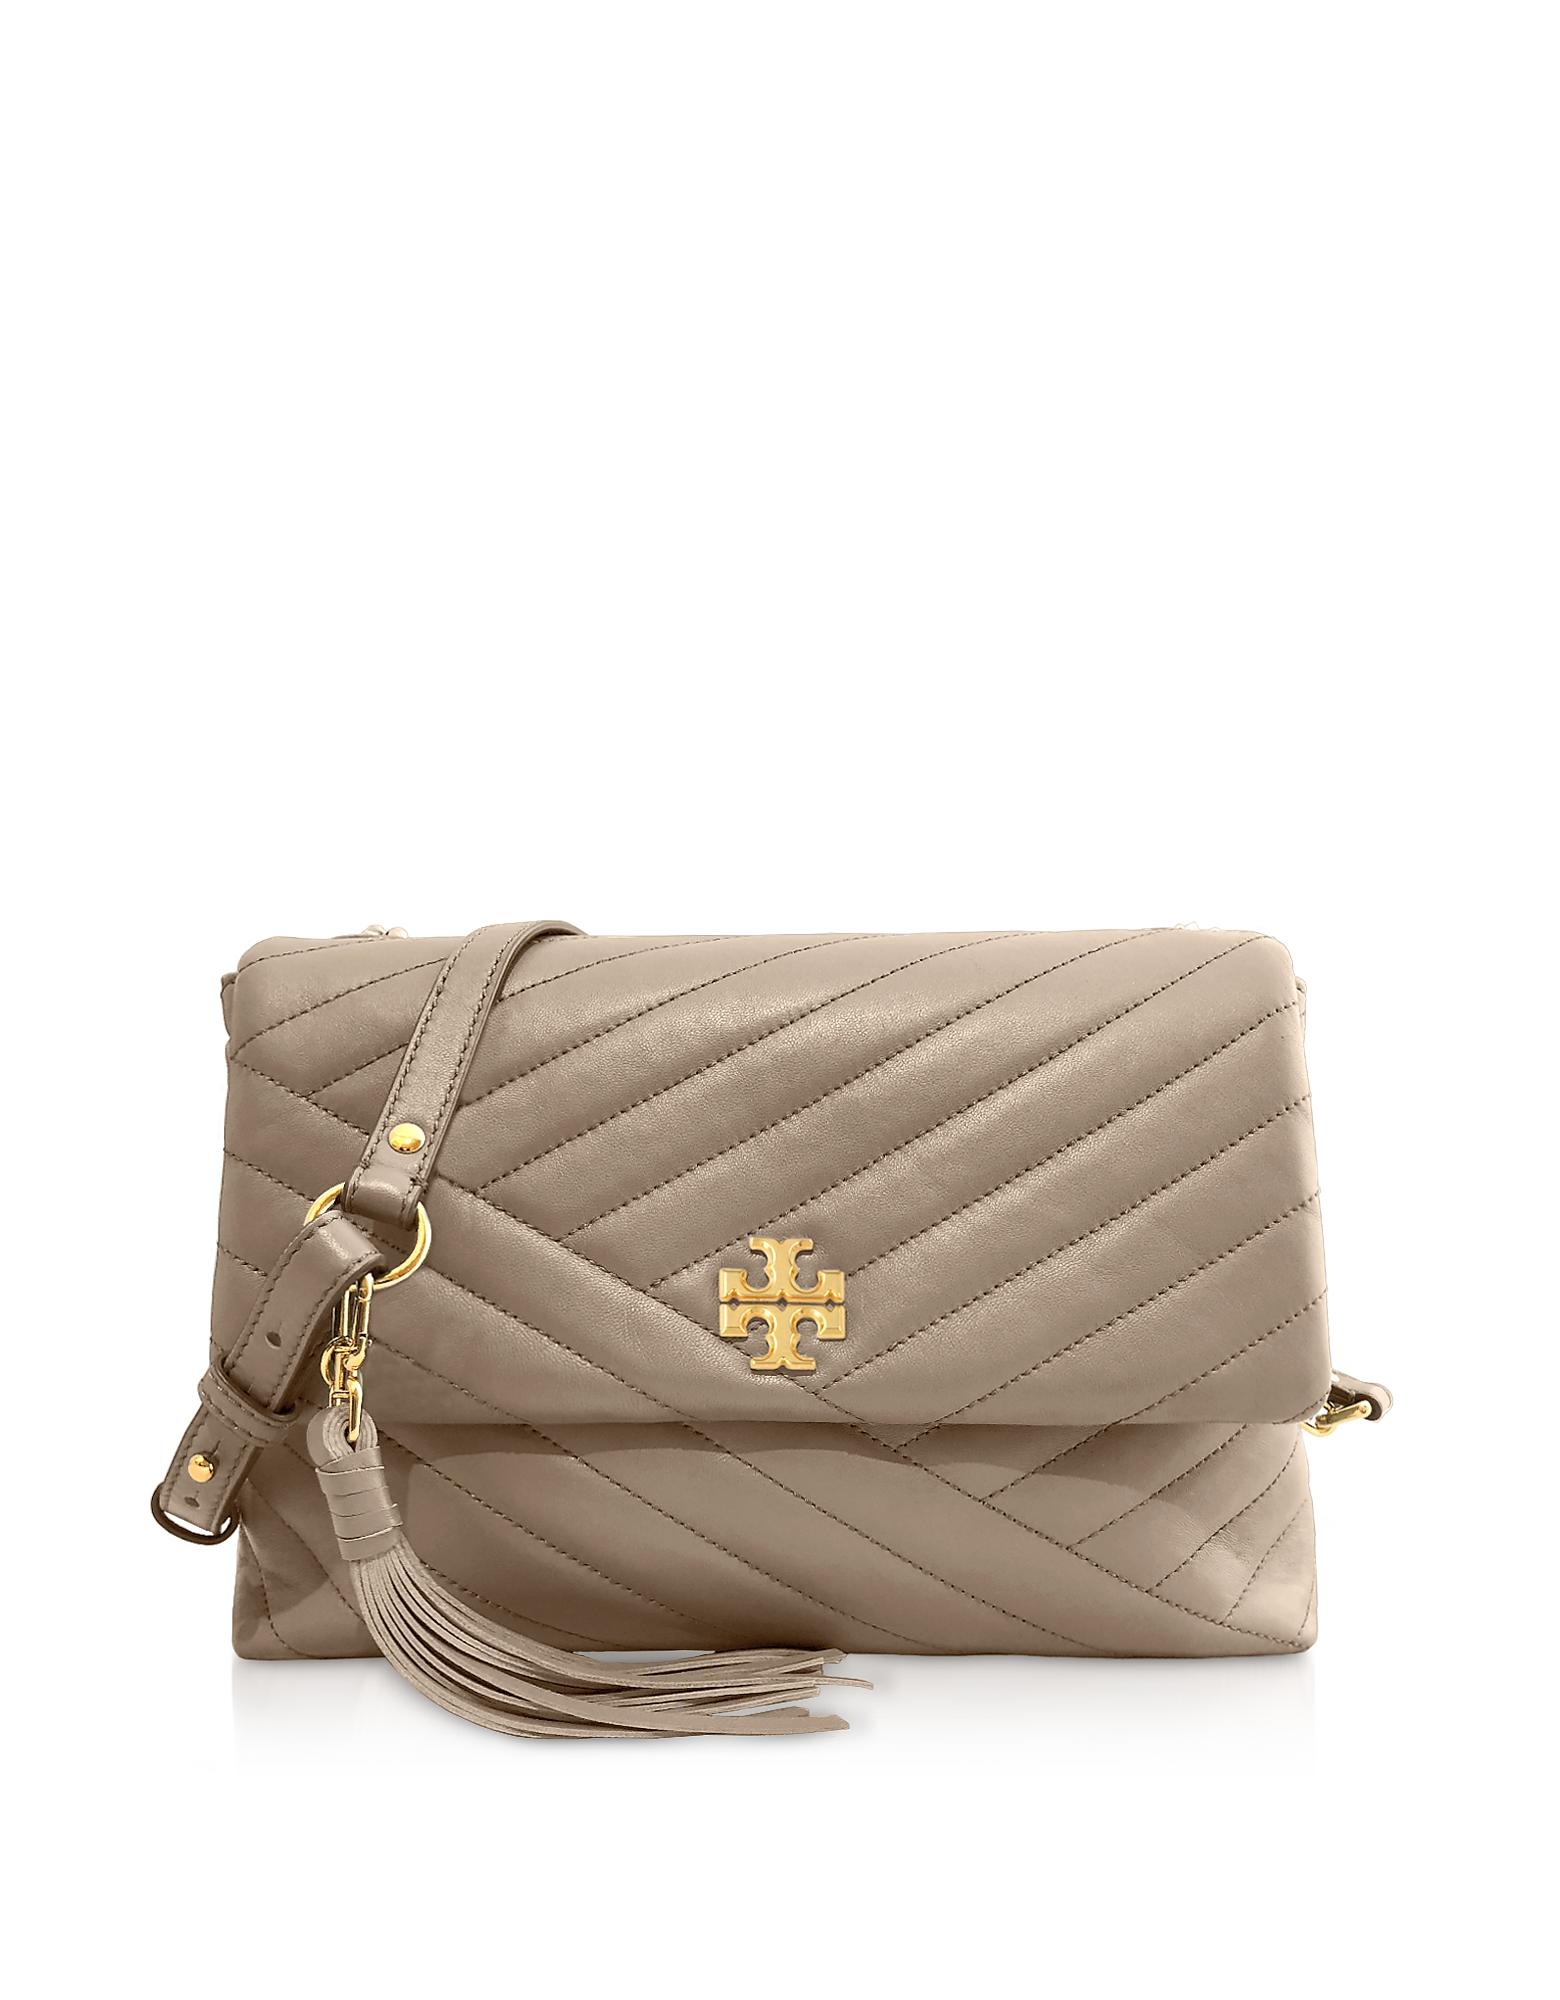 TORY BURCH | Tory Burch Designer Handbags, Kira Chevron Convertible Shoulder Bag | Goxip